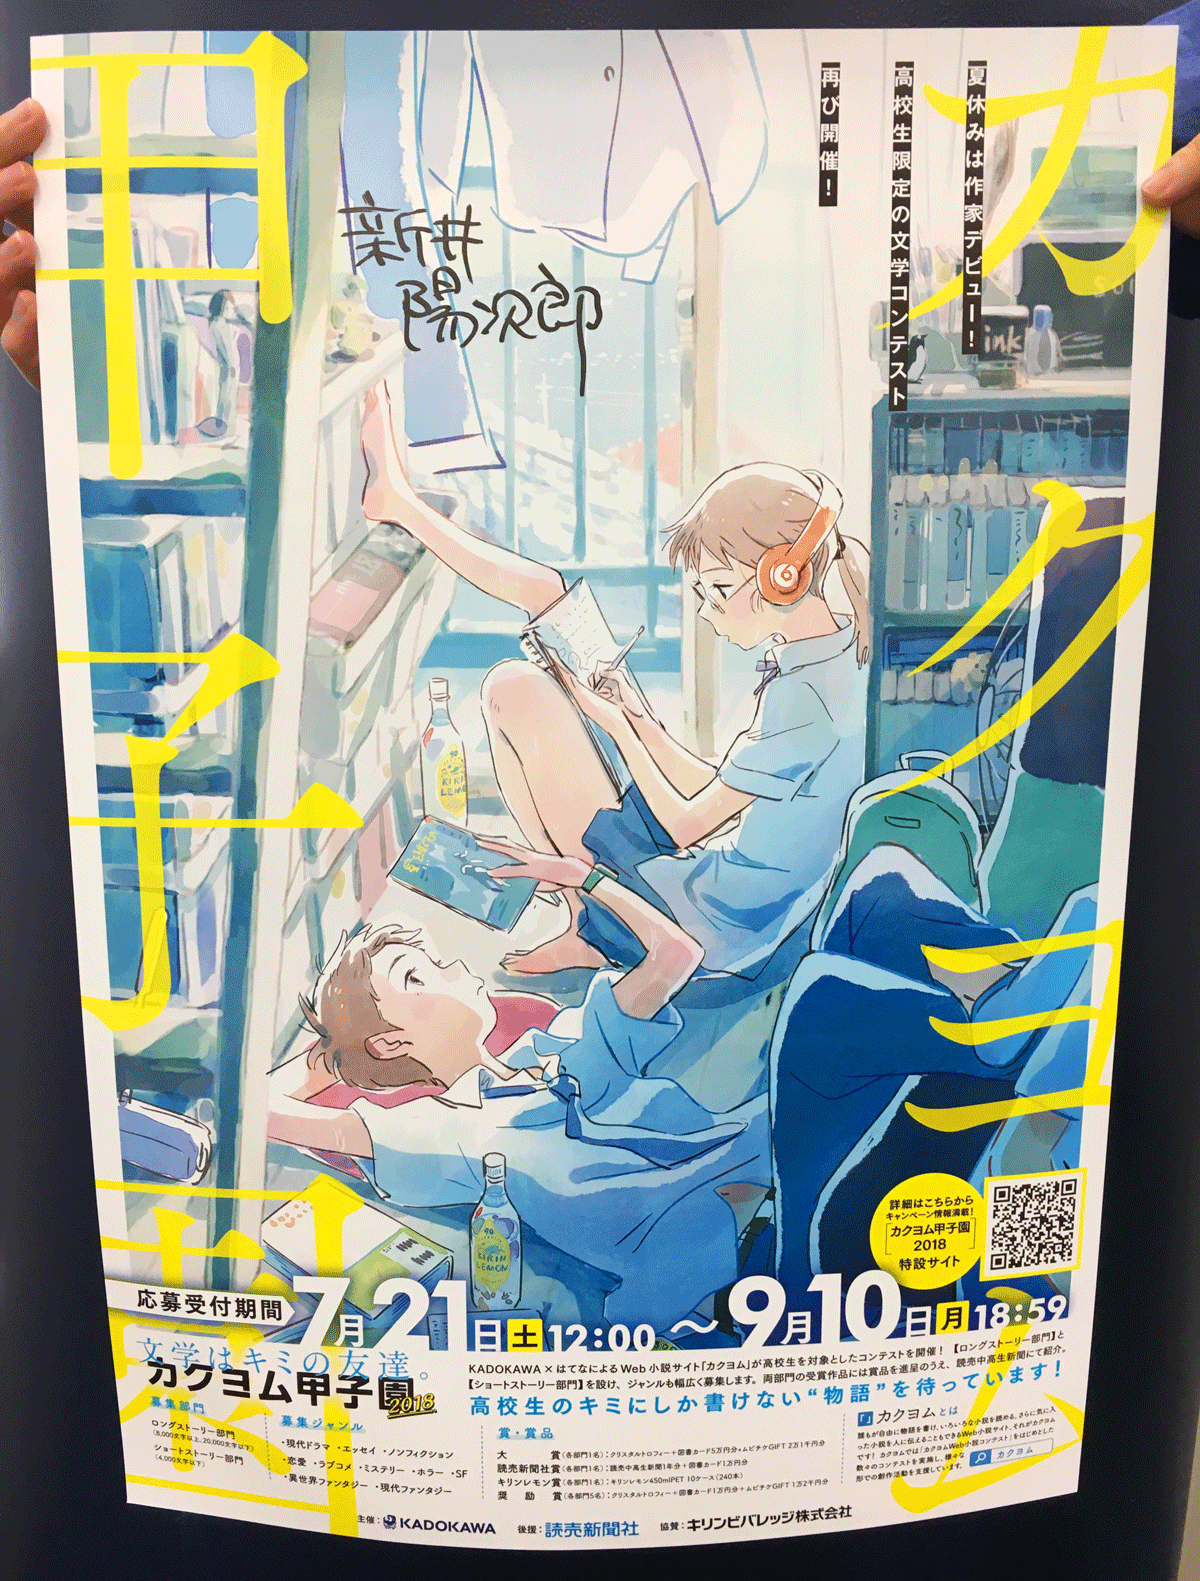 f:id:kadokawa-toko:20180720141843p:plain